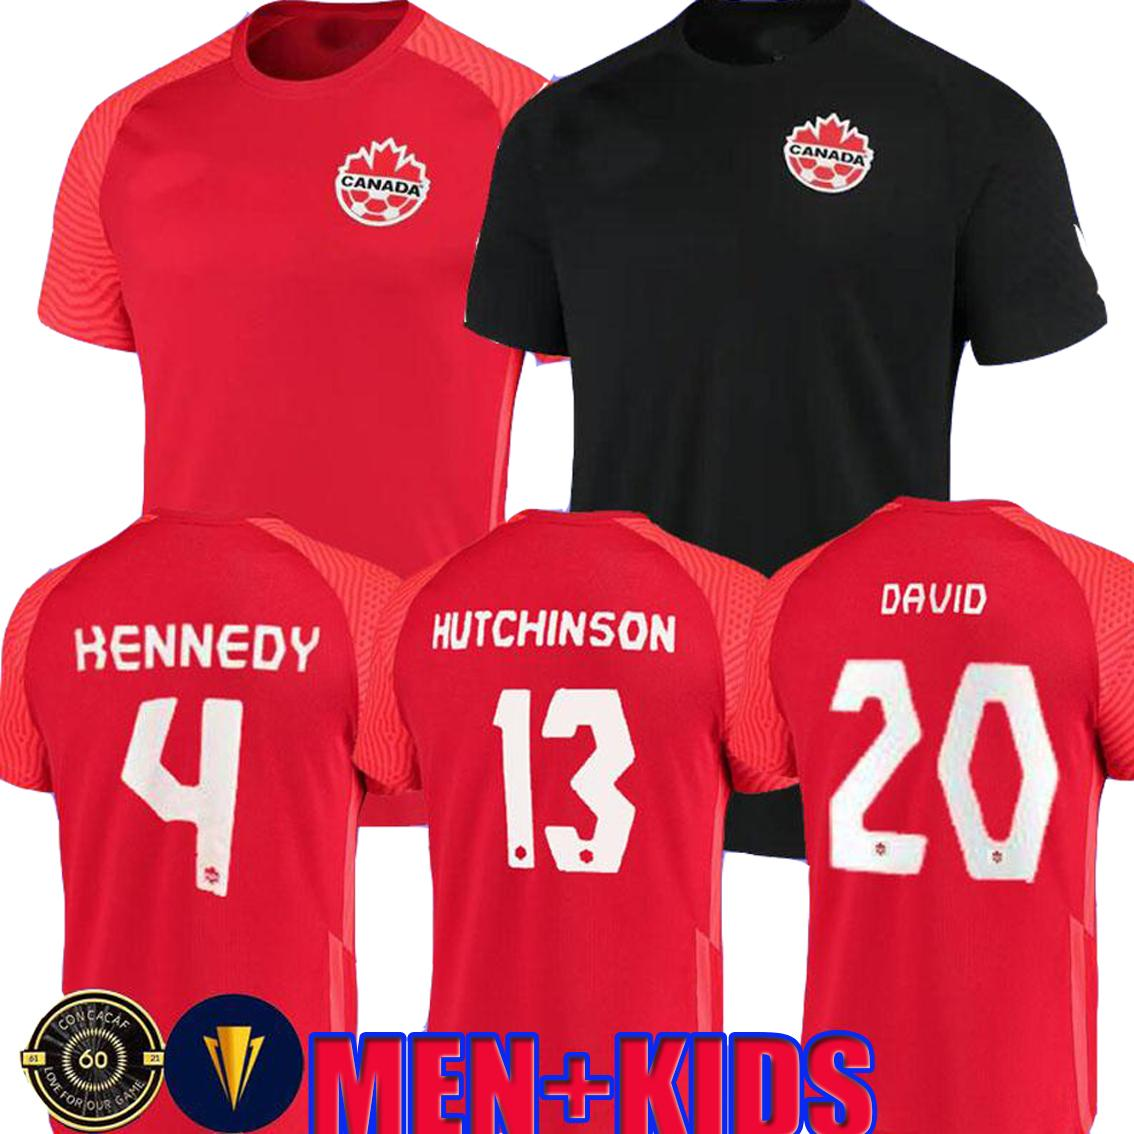 21 22 Canada Football Jerseys Équipe nationale Concacaf Gold Cup Evstaquio Hutchinson 2021 Davies David Larin Cavallini Laryea Millar Honette Kennedy Football Shirts